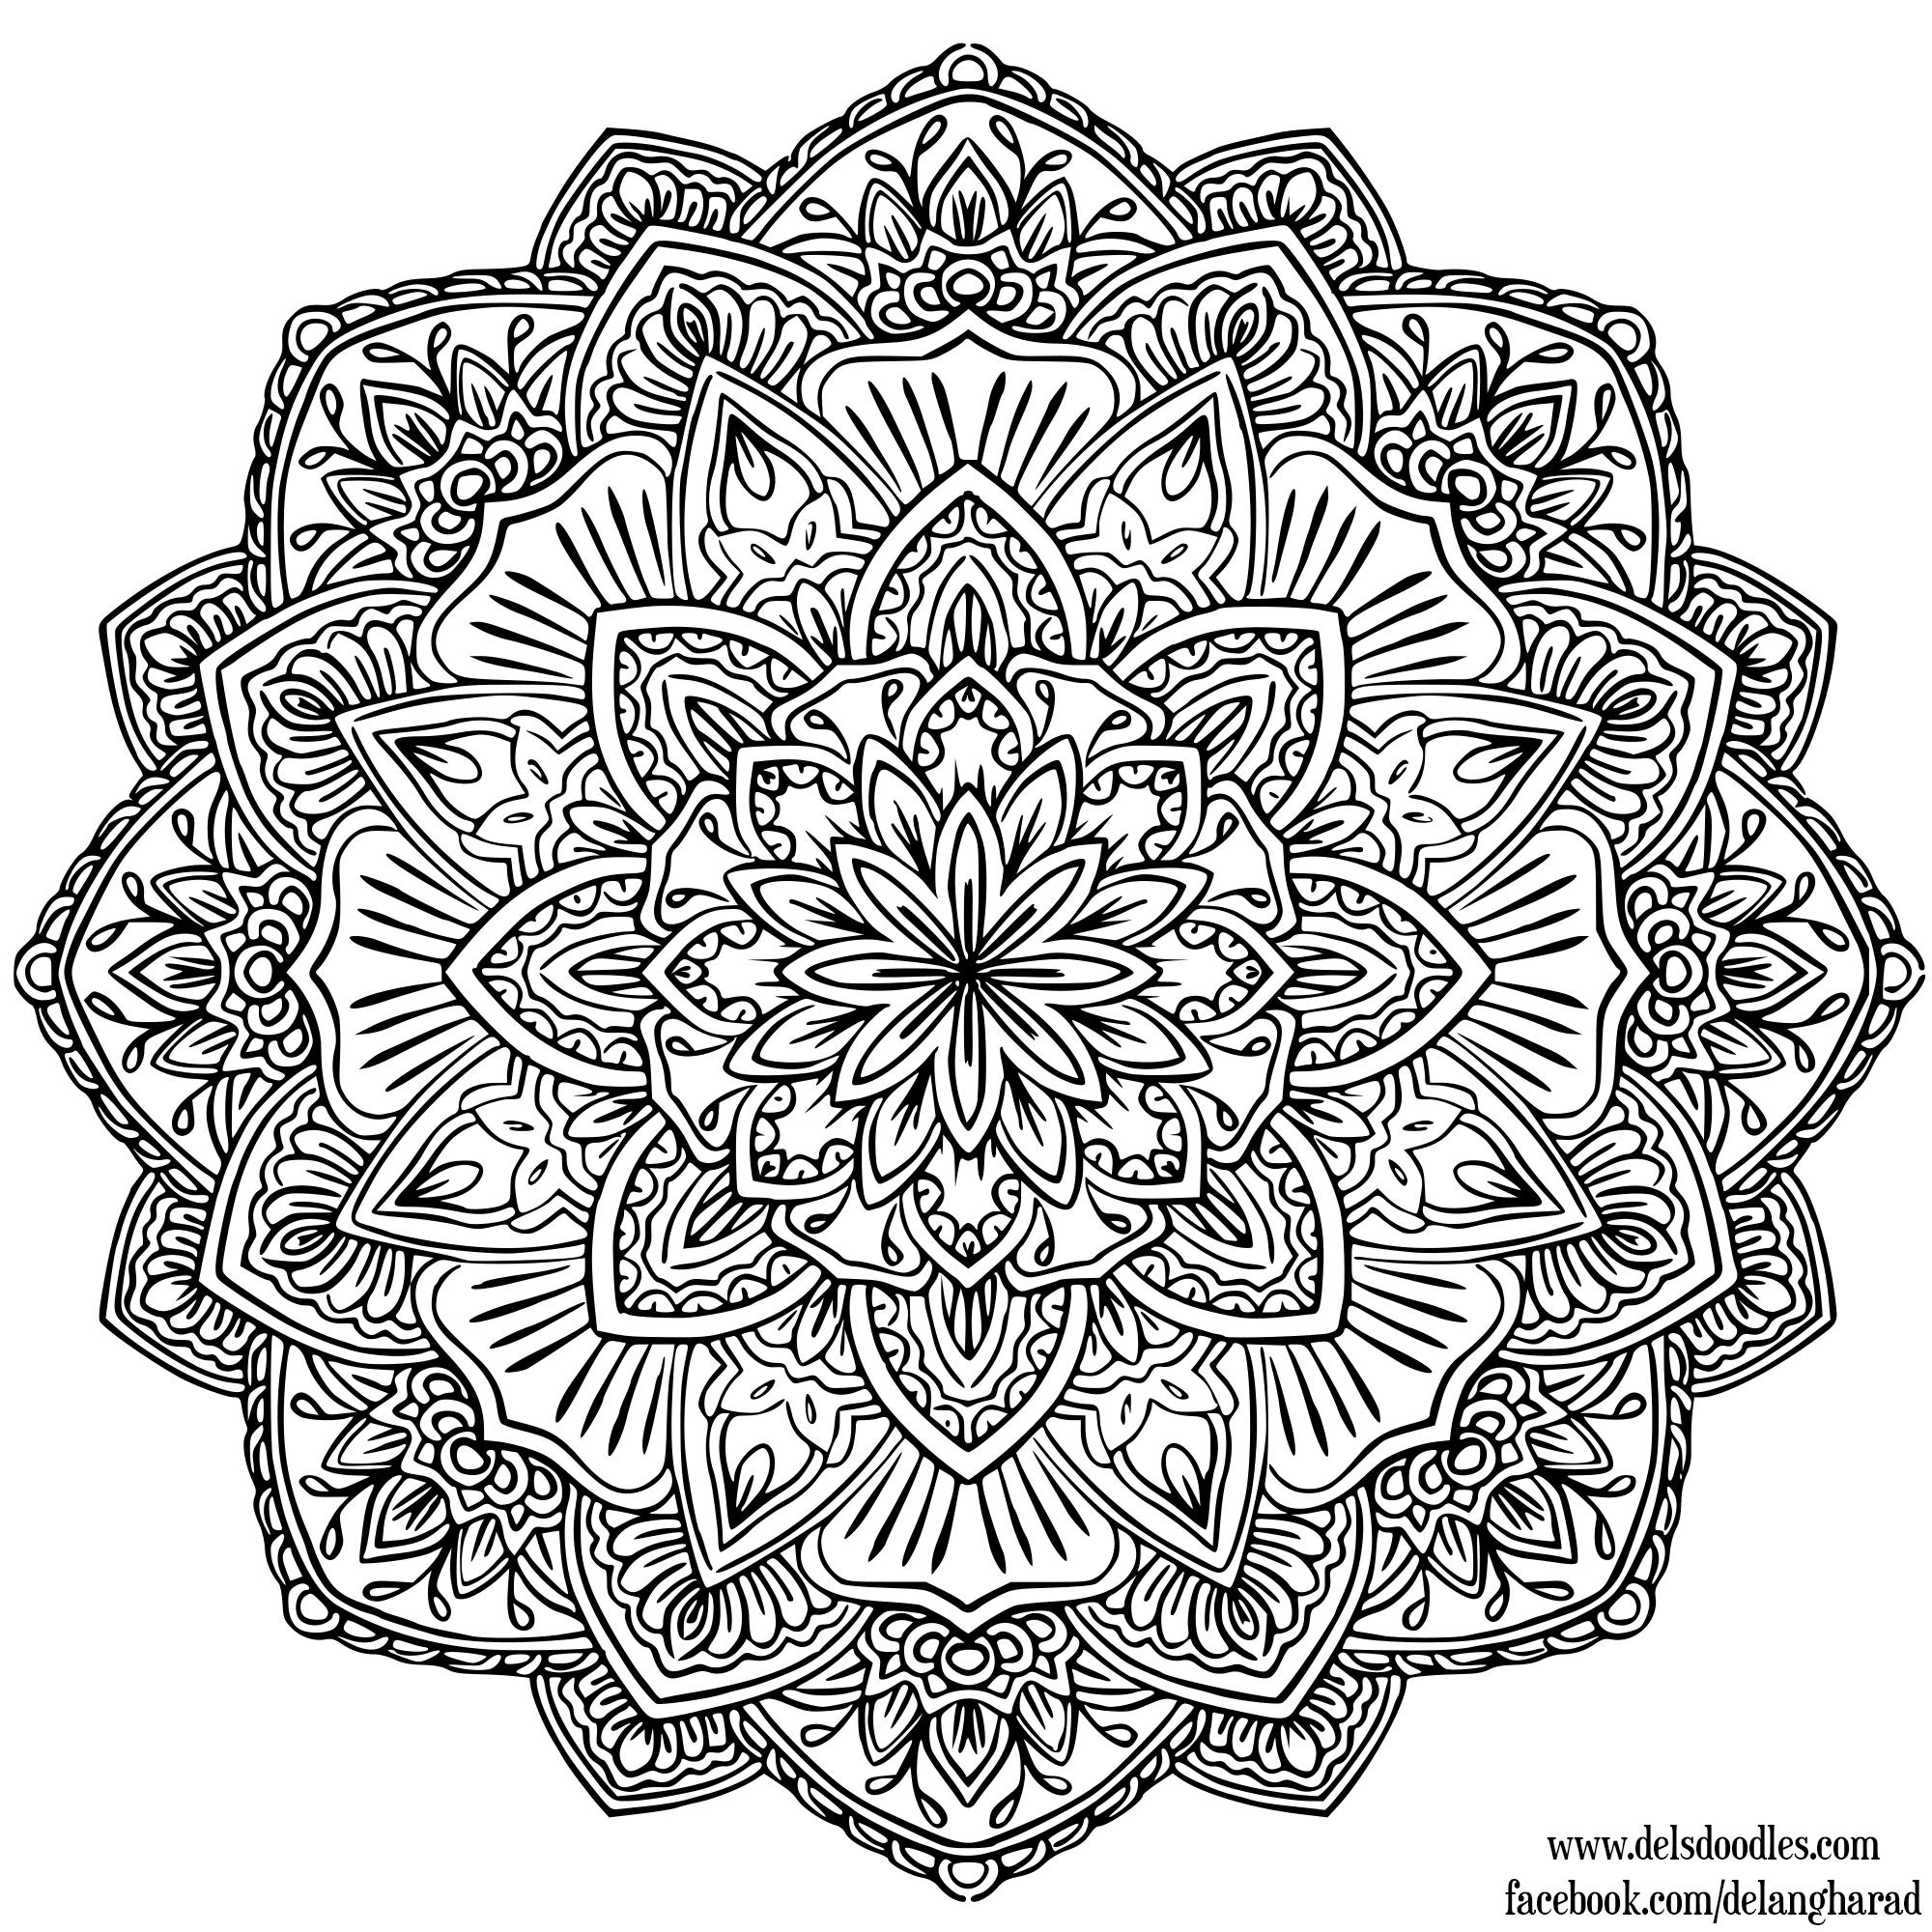 mandala to color beautiful free mandala coloring pages skip to my lou color to mandala